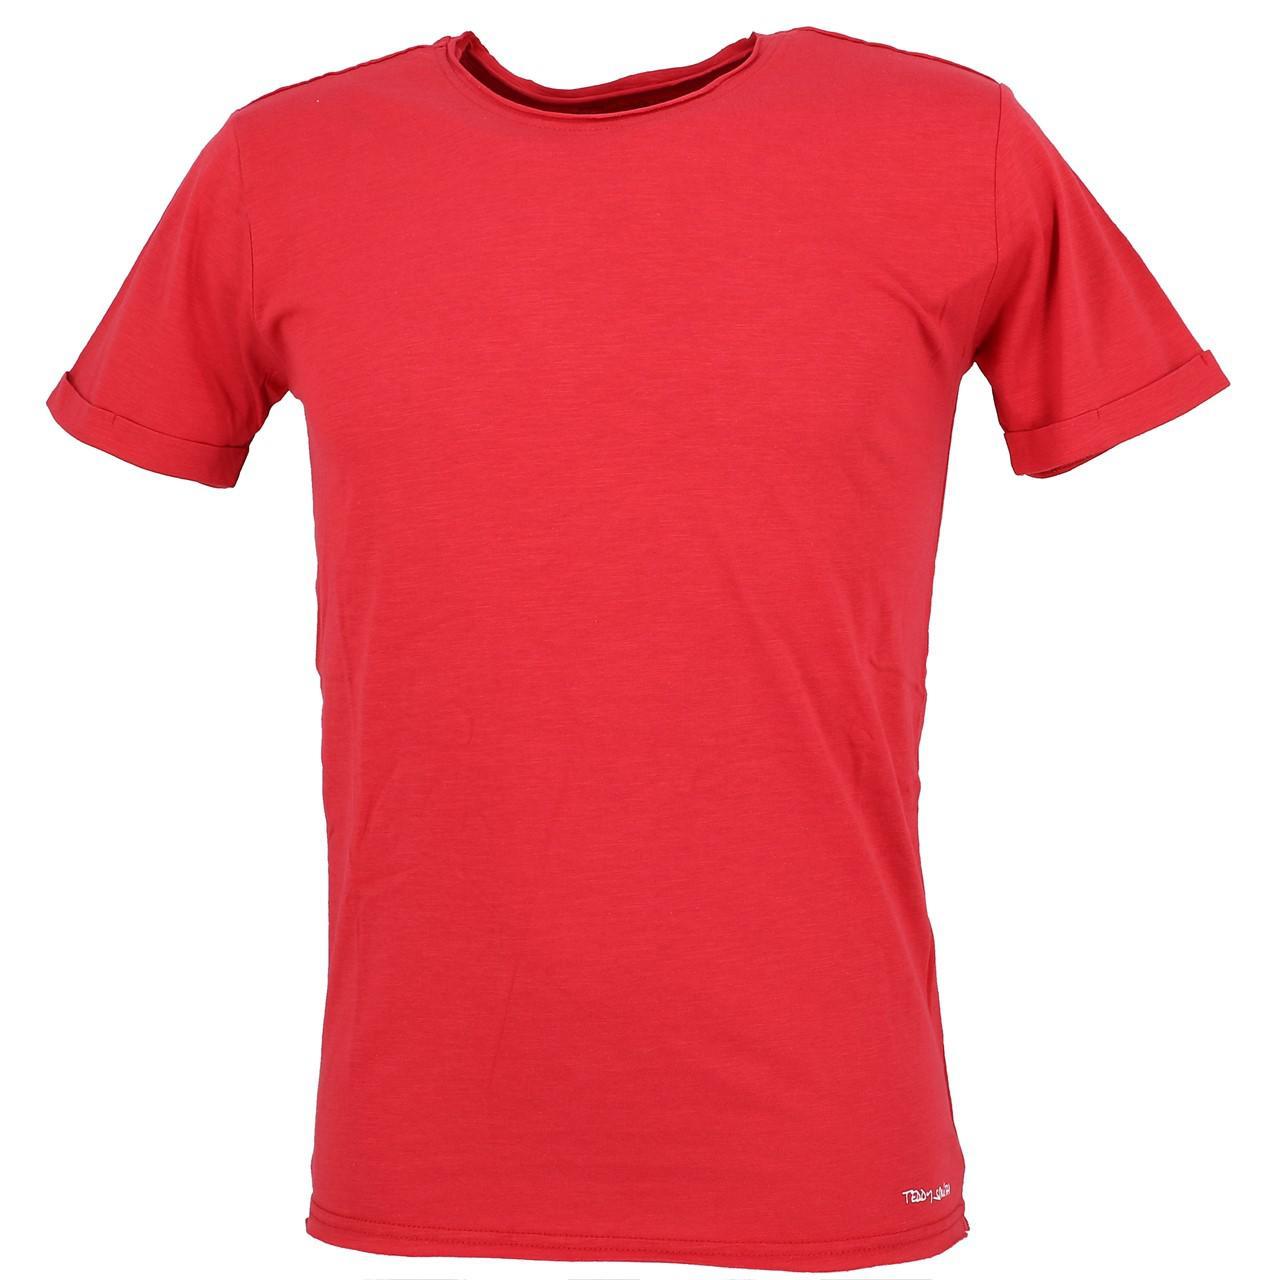 Short-Teddy-smith-Turos-Red-Mc-Tee-Red-30023-New